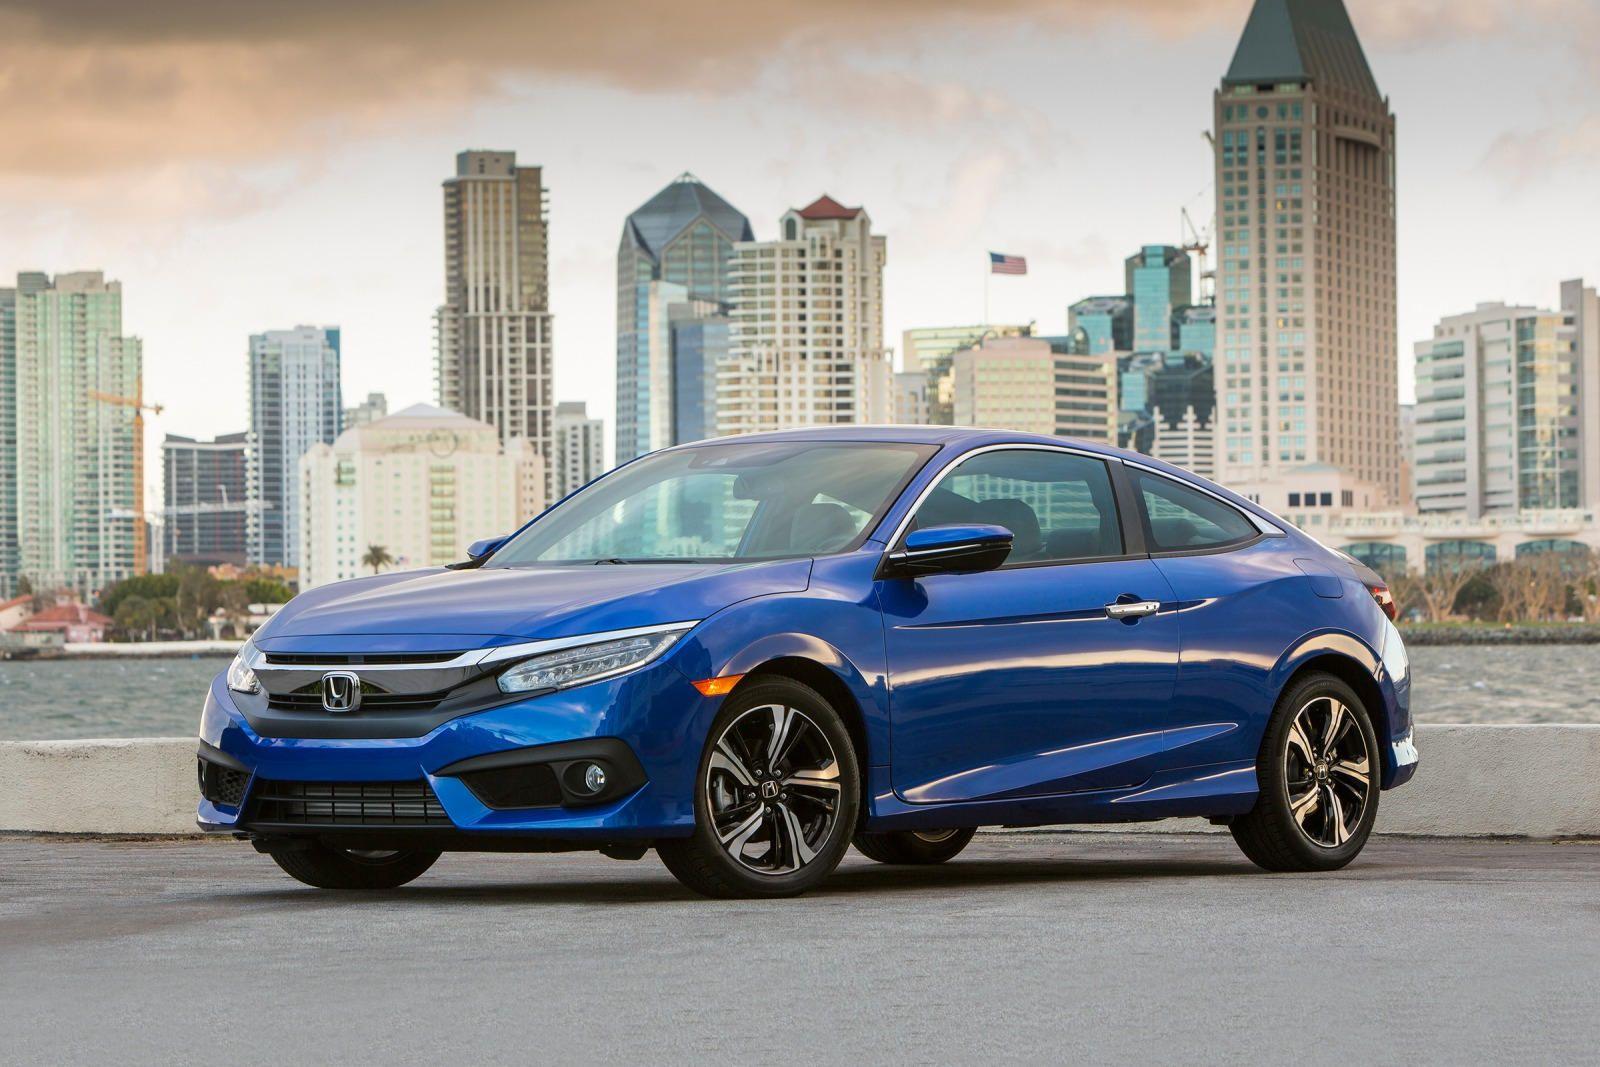 """The stylish 2018 Honda Civic Coupe never fails to impress"